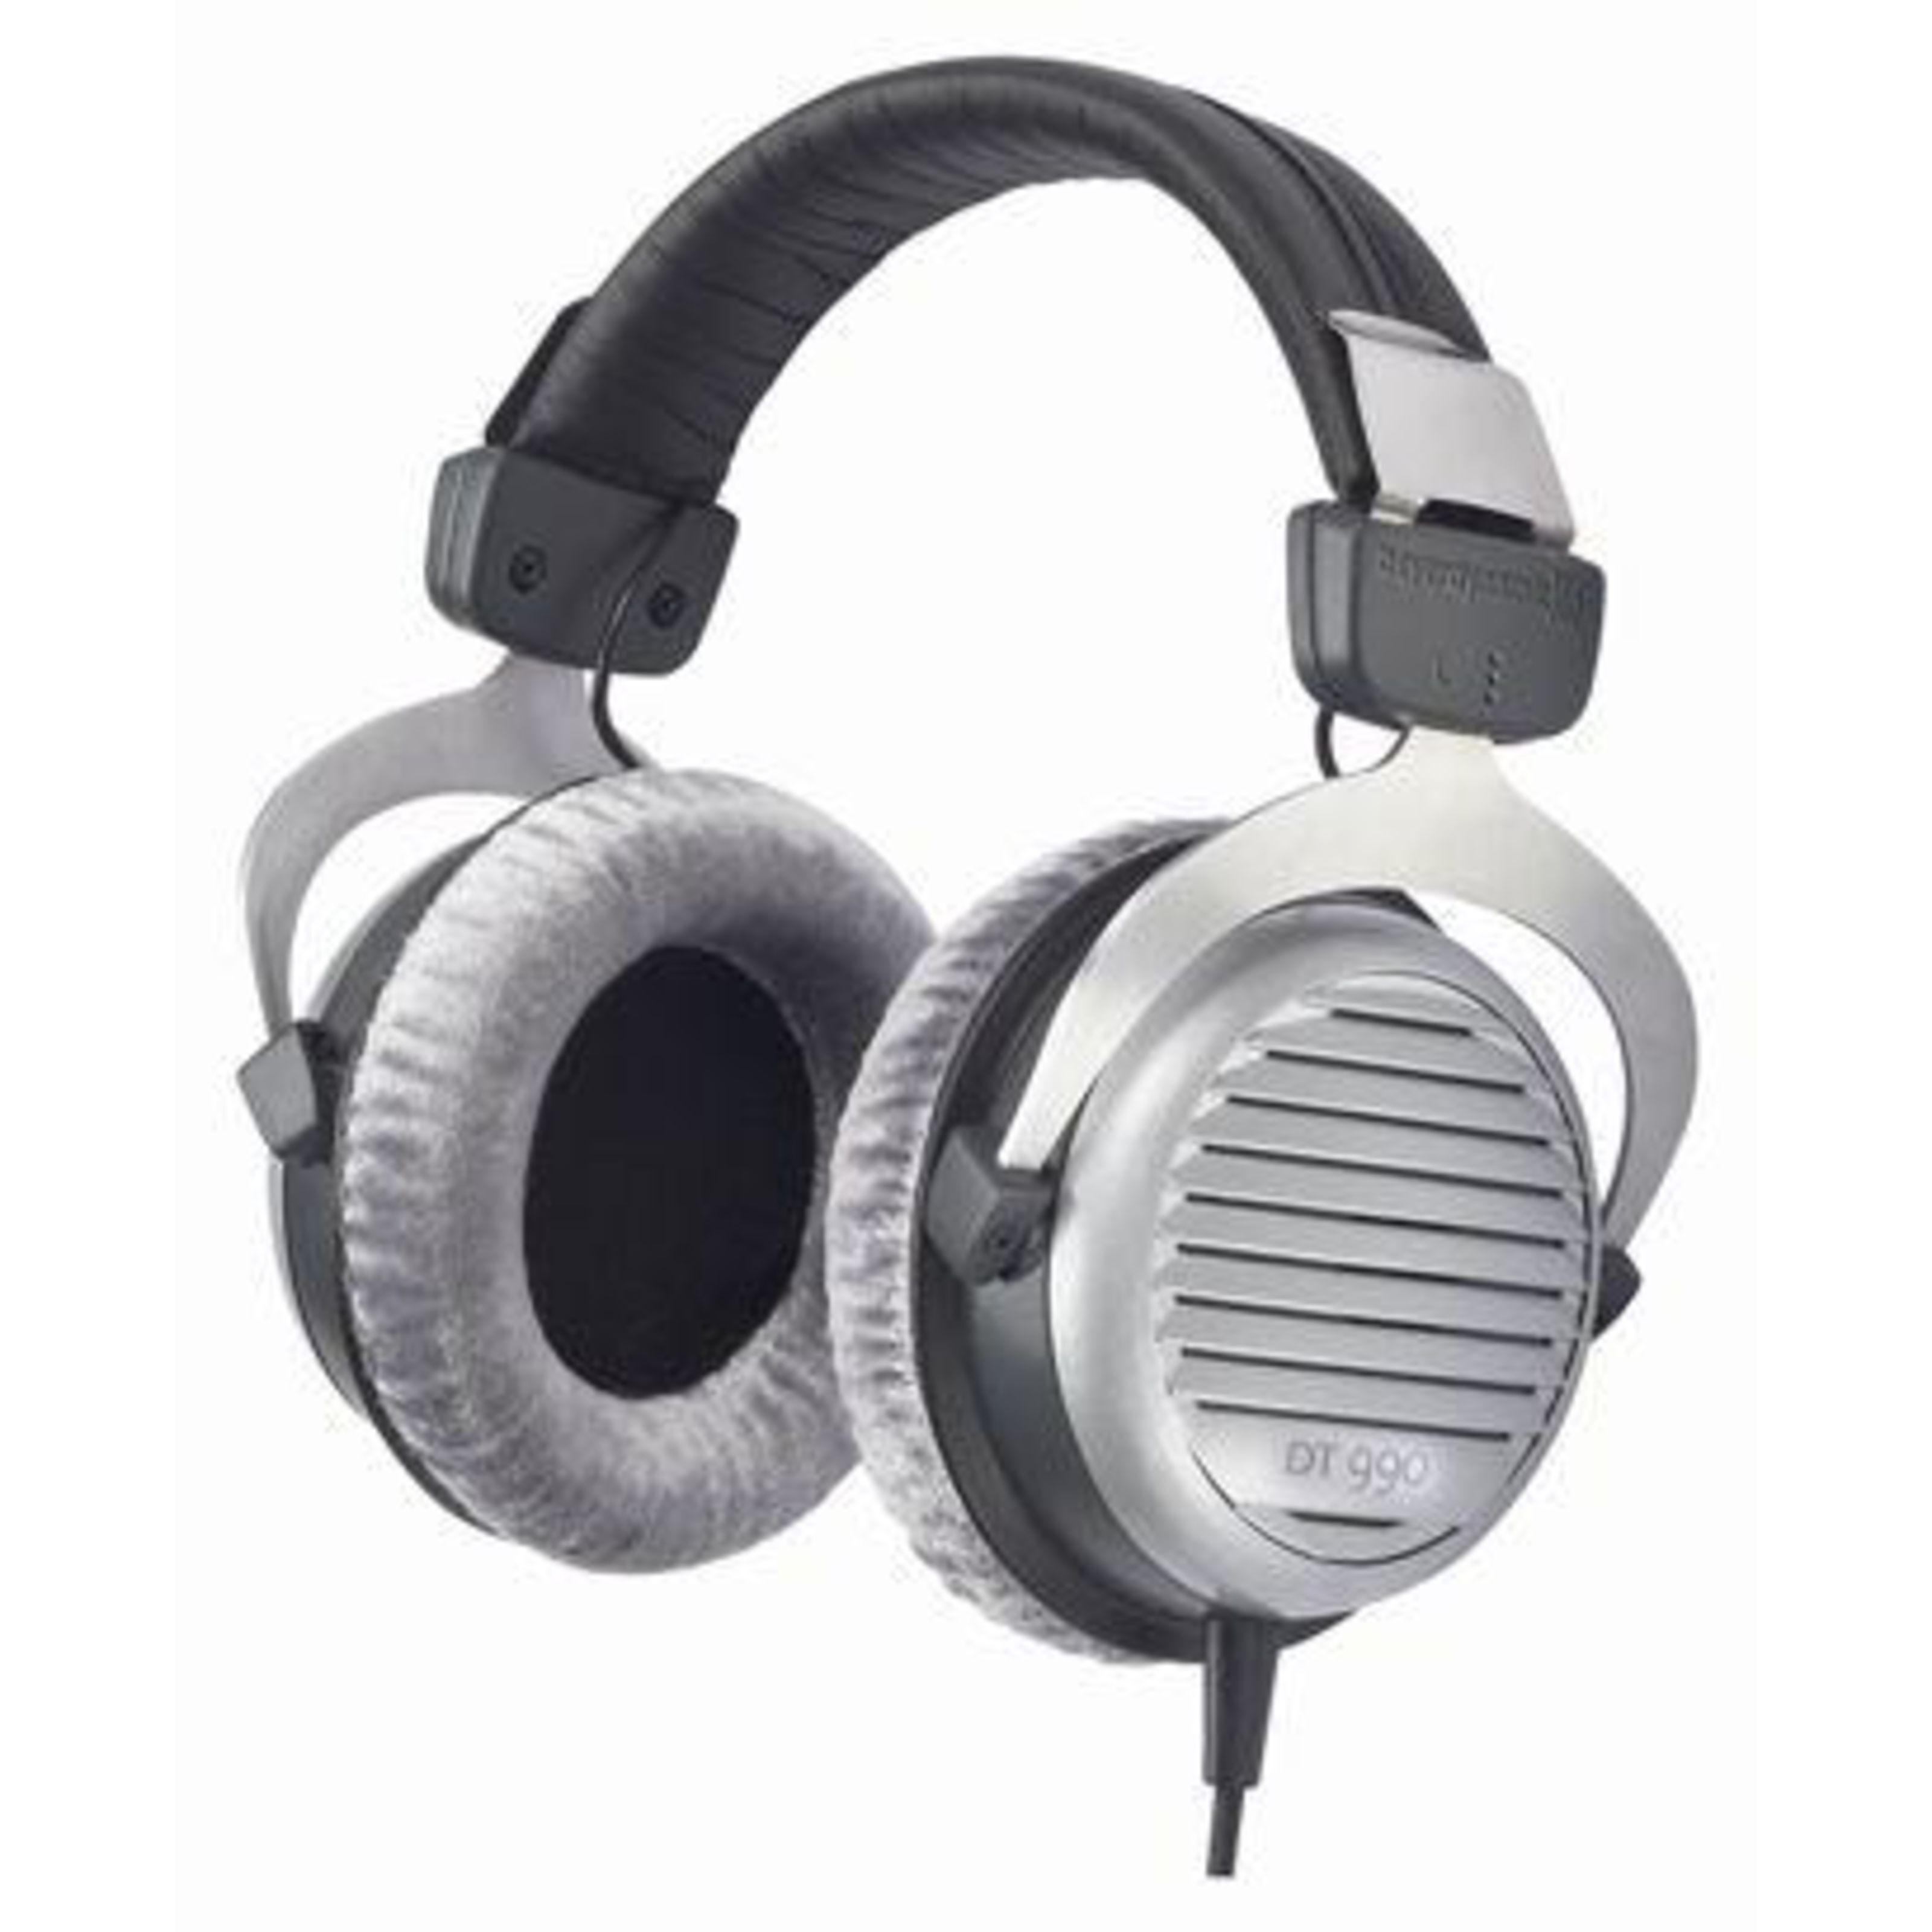 beyerdynamic - DT 990 Edition 250 ohm Premium Kopfhörer,offen